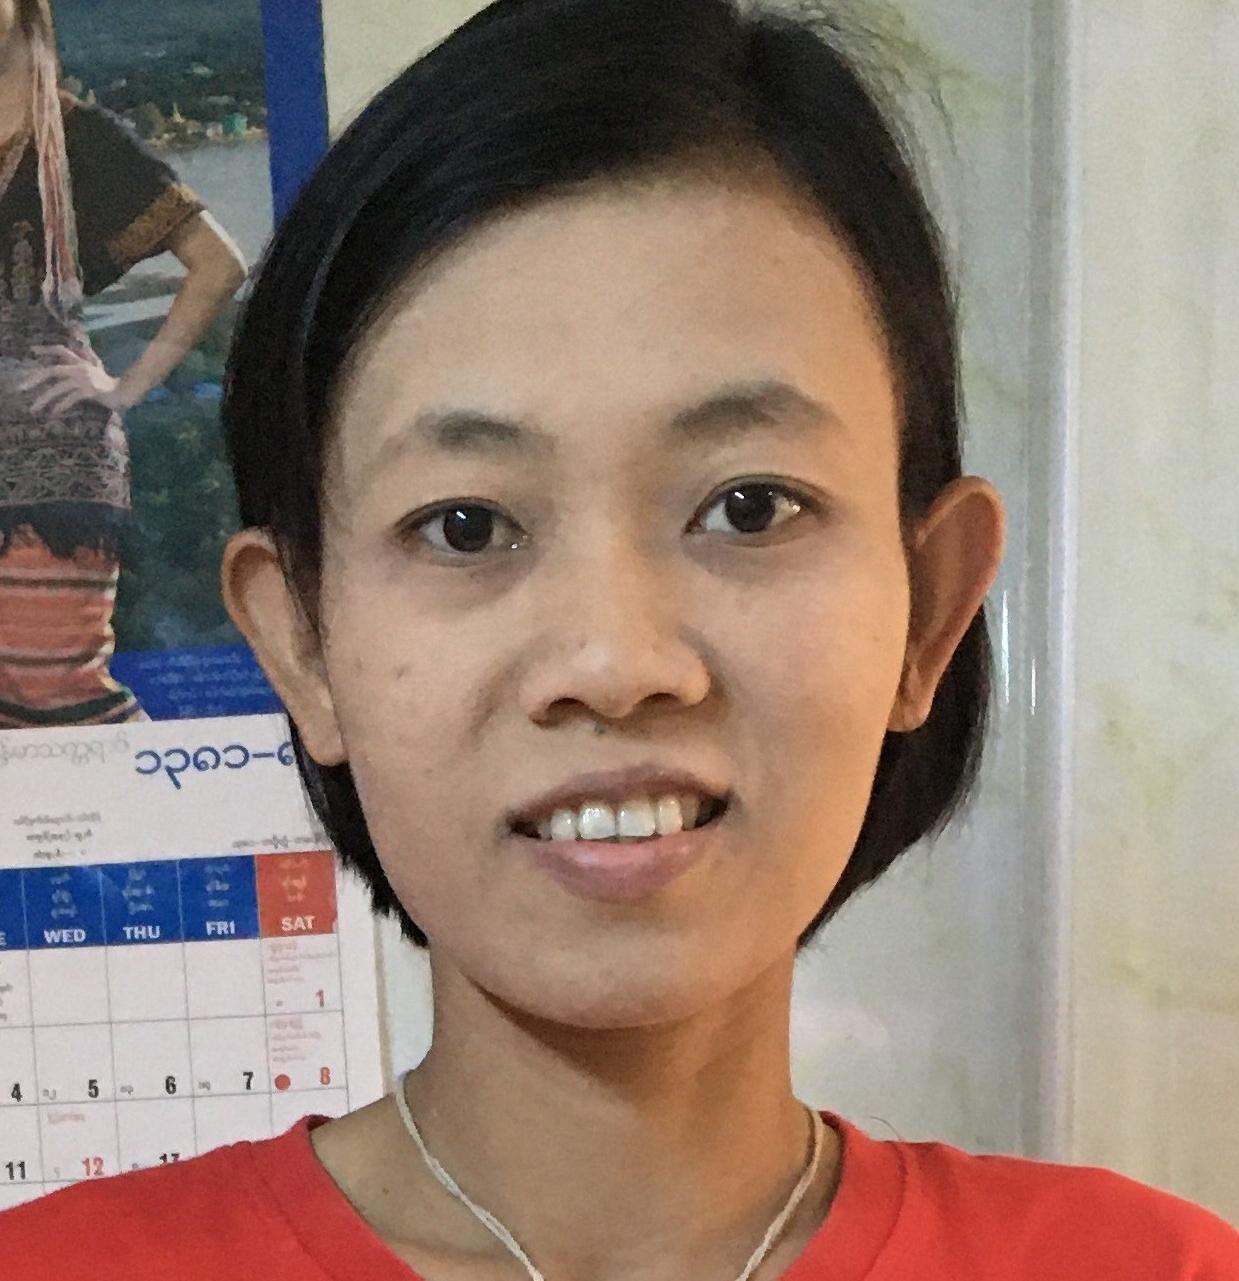 Myanmar Fresh Maid - MYINT ZU AYE (KS-101)